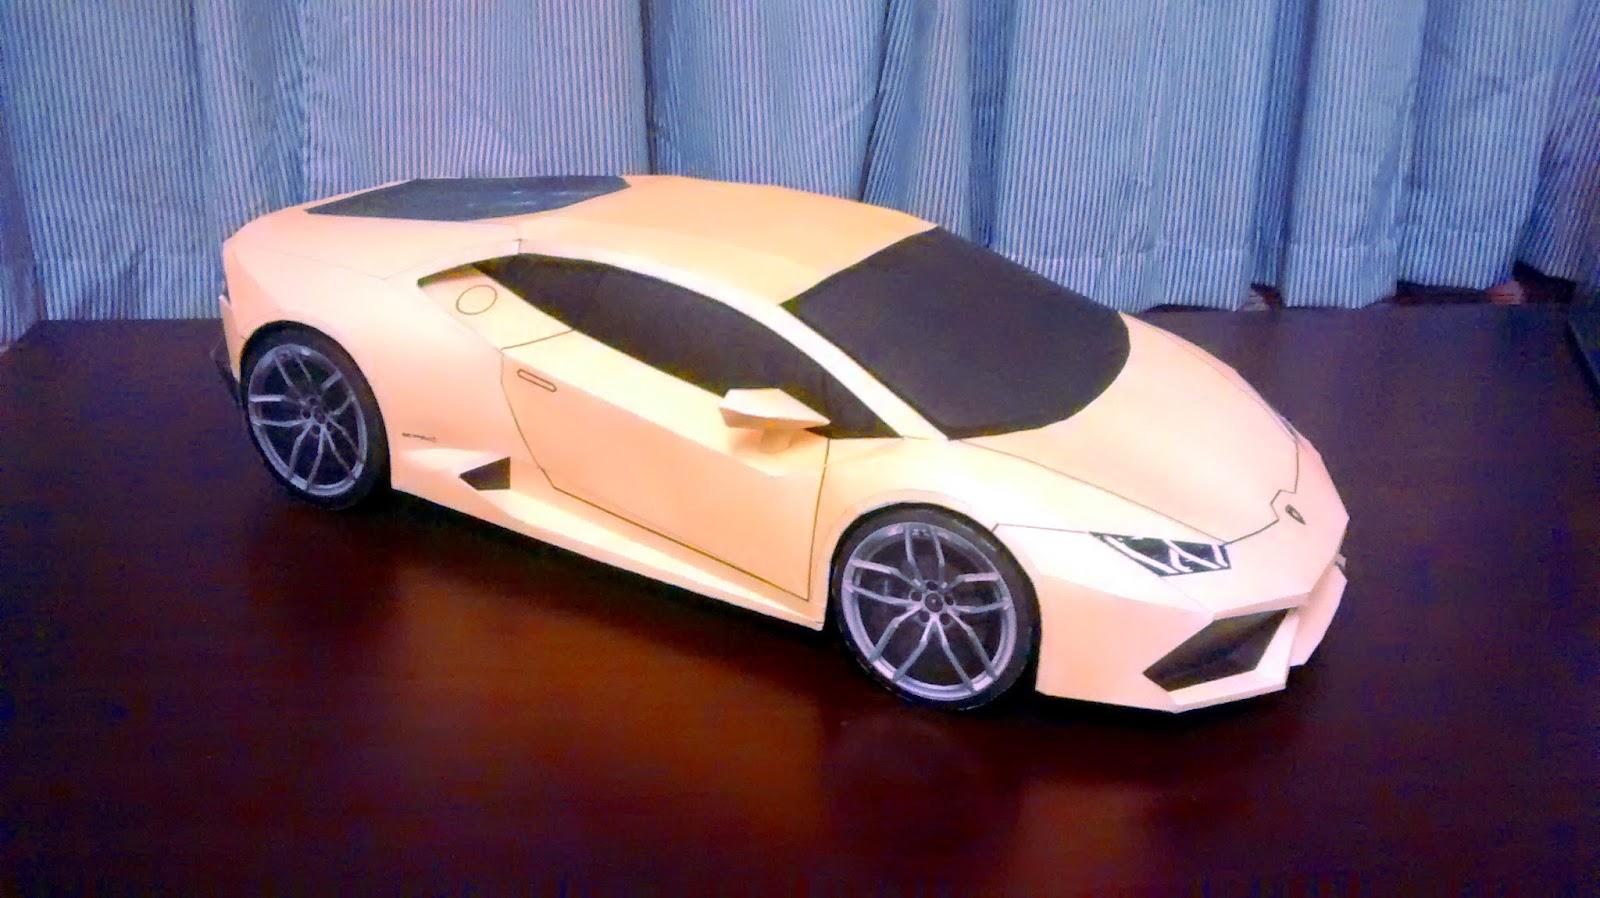 Yoshiny S Design Lamborghini Huracan Papercraft